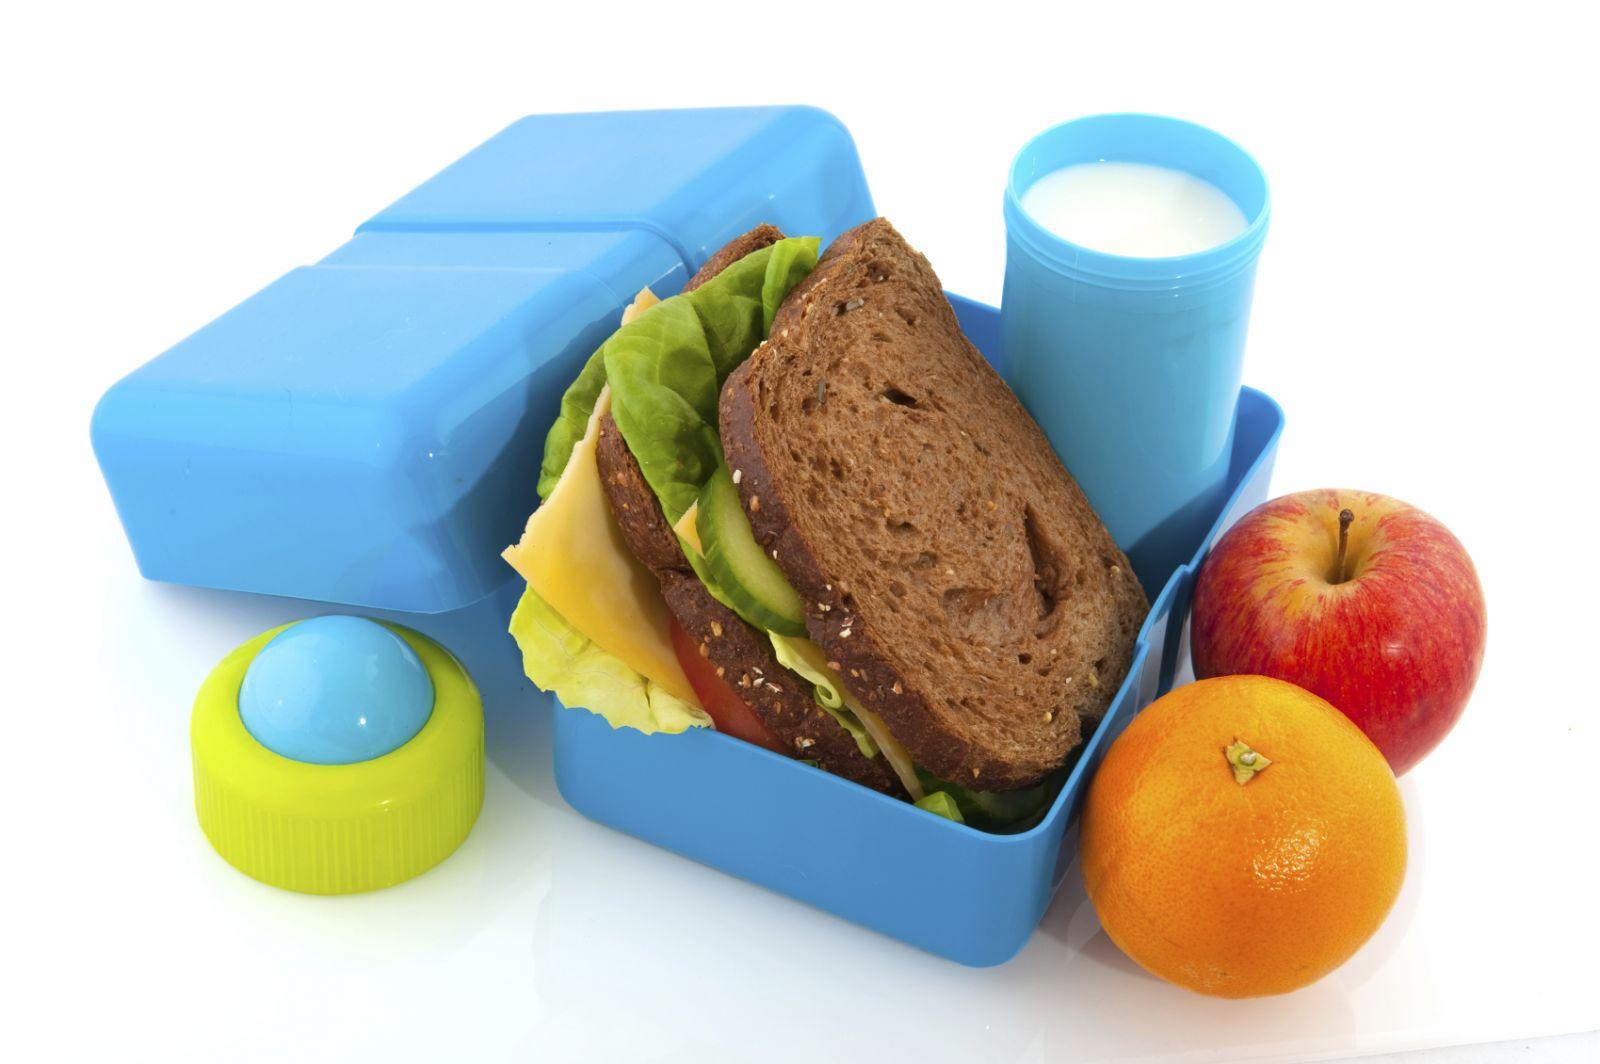 dieta balanceada para un nino: